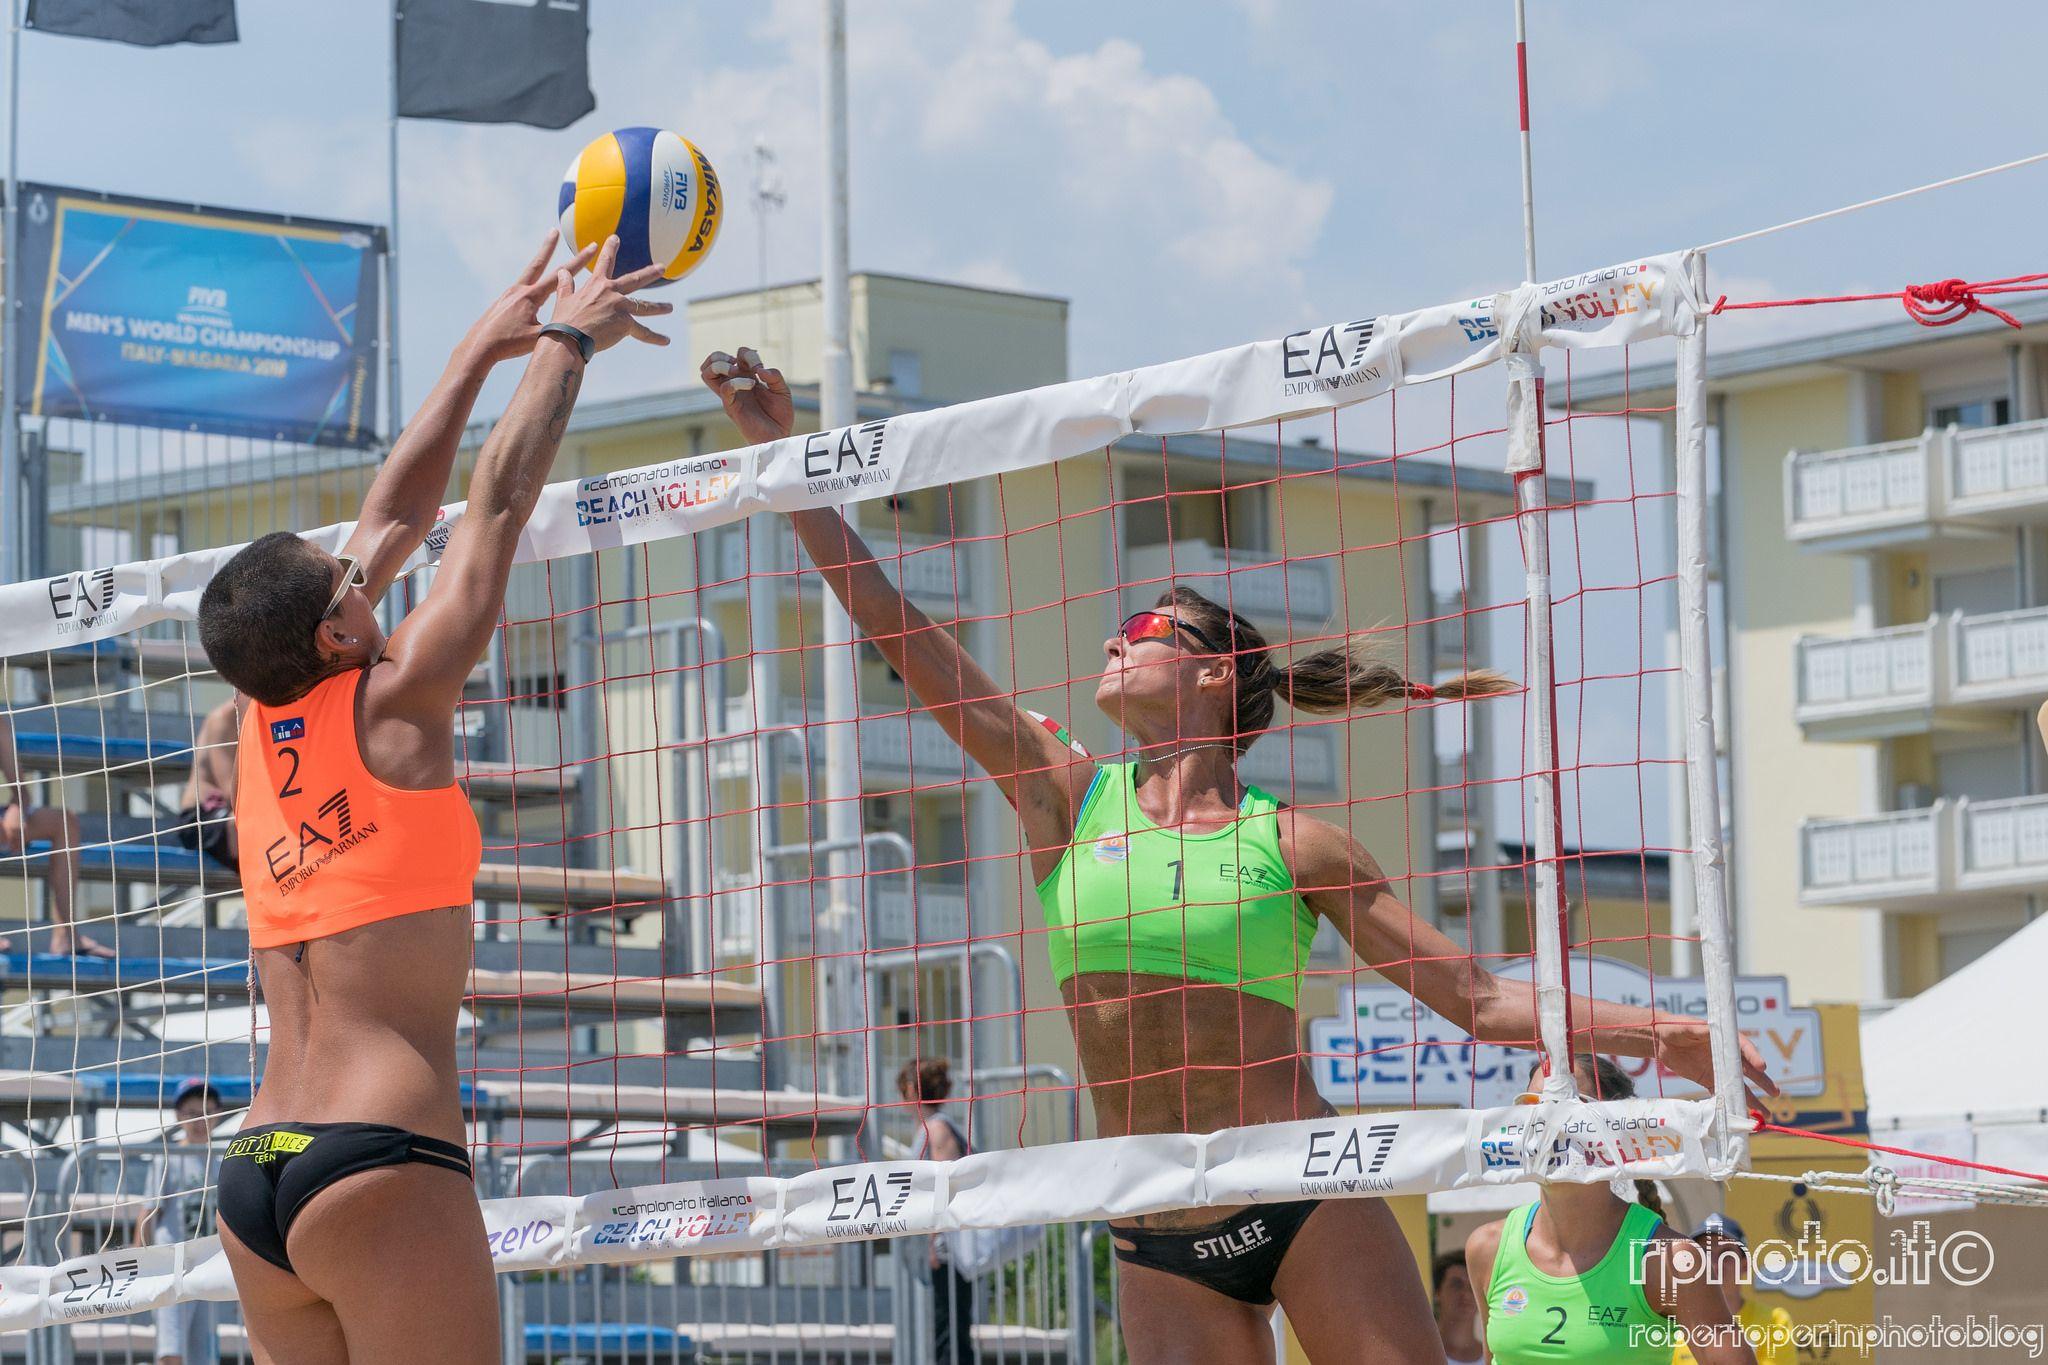 2 Tappa Campionato Italiano Beach Volley Beach Volleyball Volley Volleyball Players